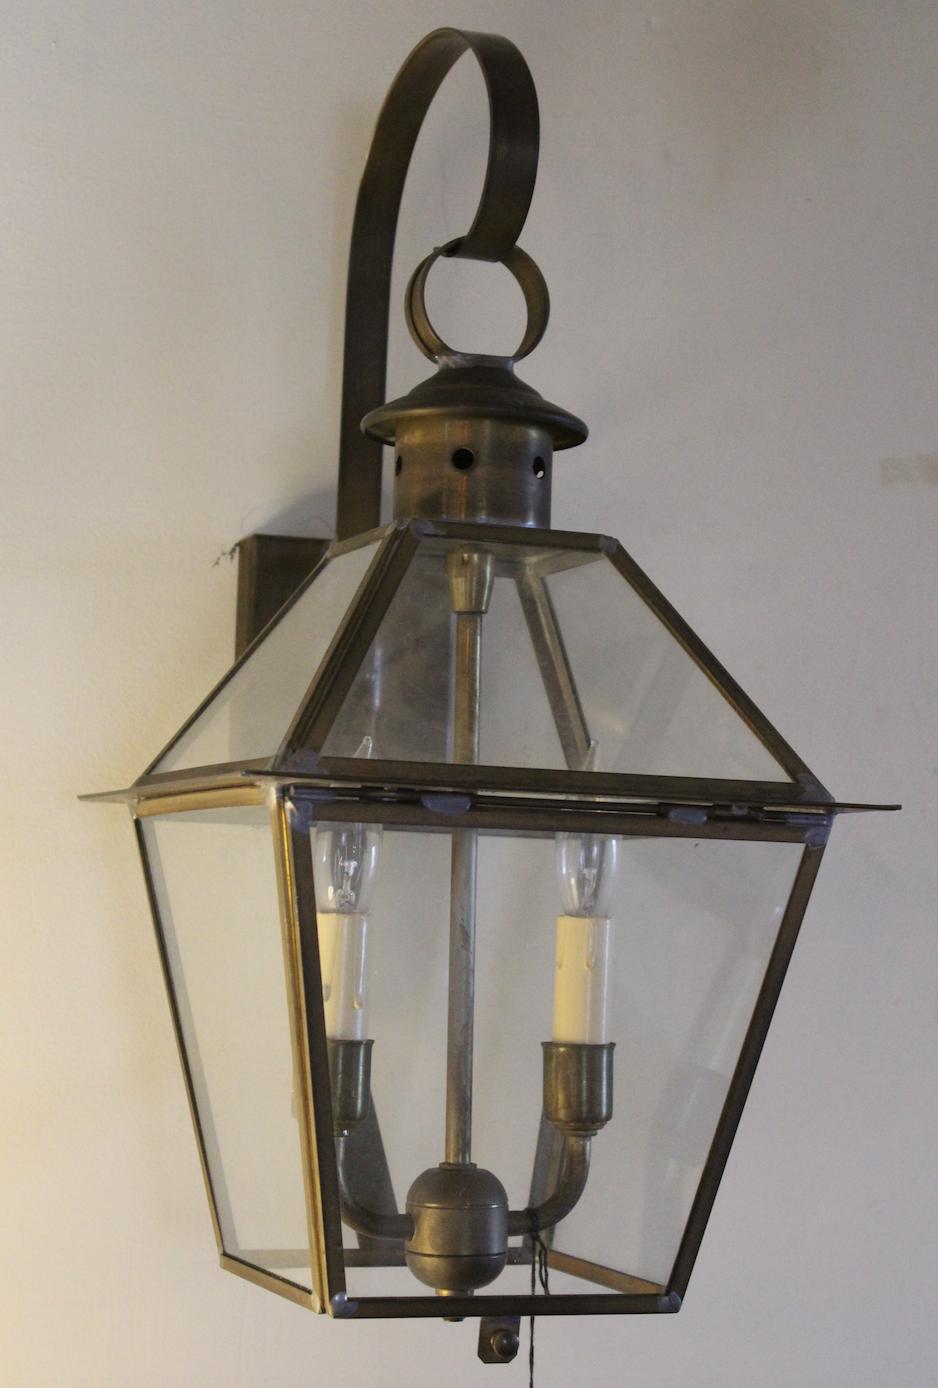 American Period Lighting Reallancastercounty Real